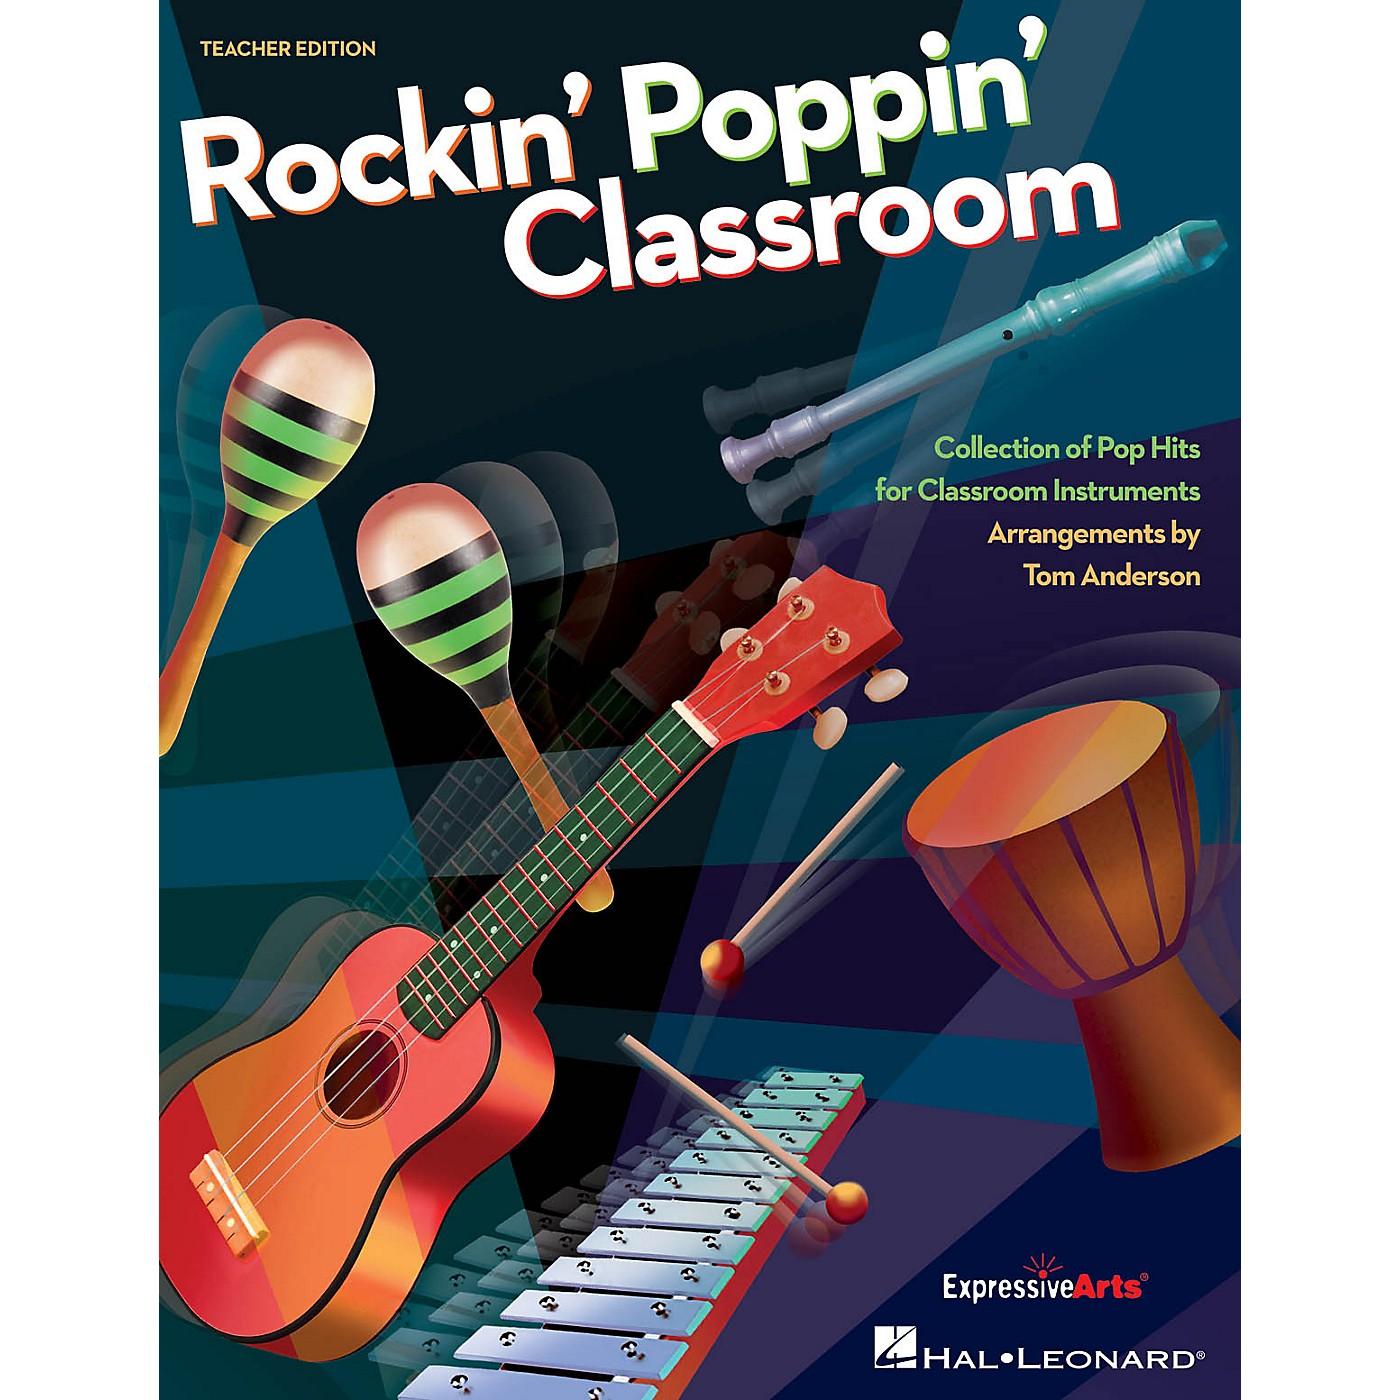 Hal Leonard Rockin' Poppin' Classroom student 20 pak Arranged by Tom Anderson thumbnail